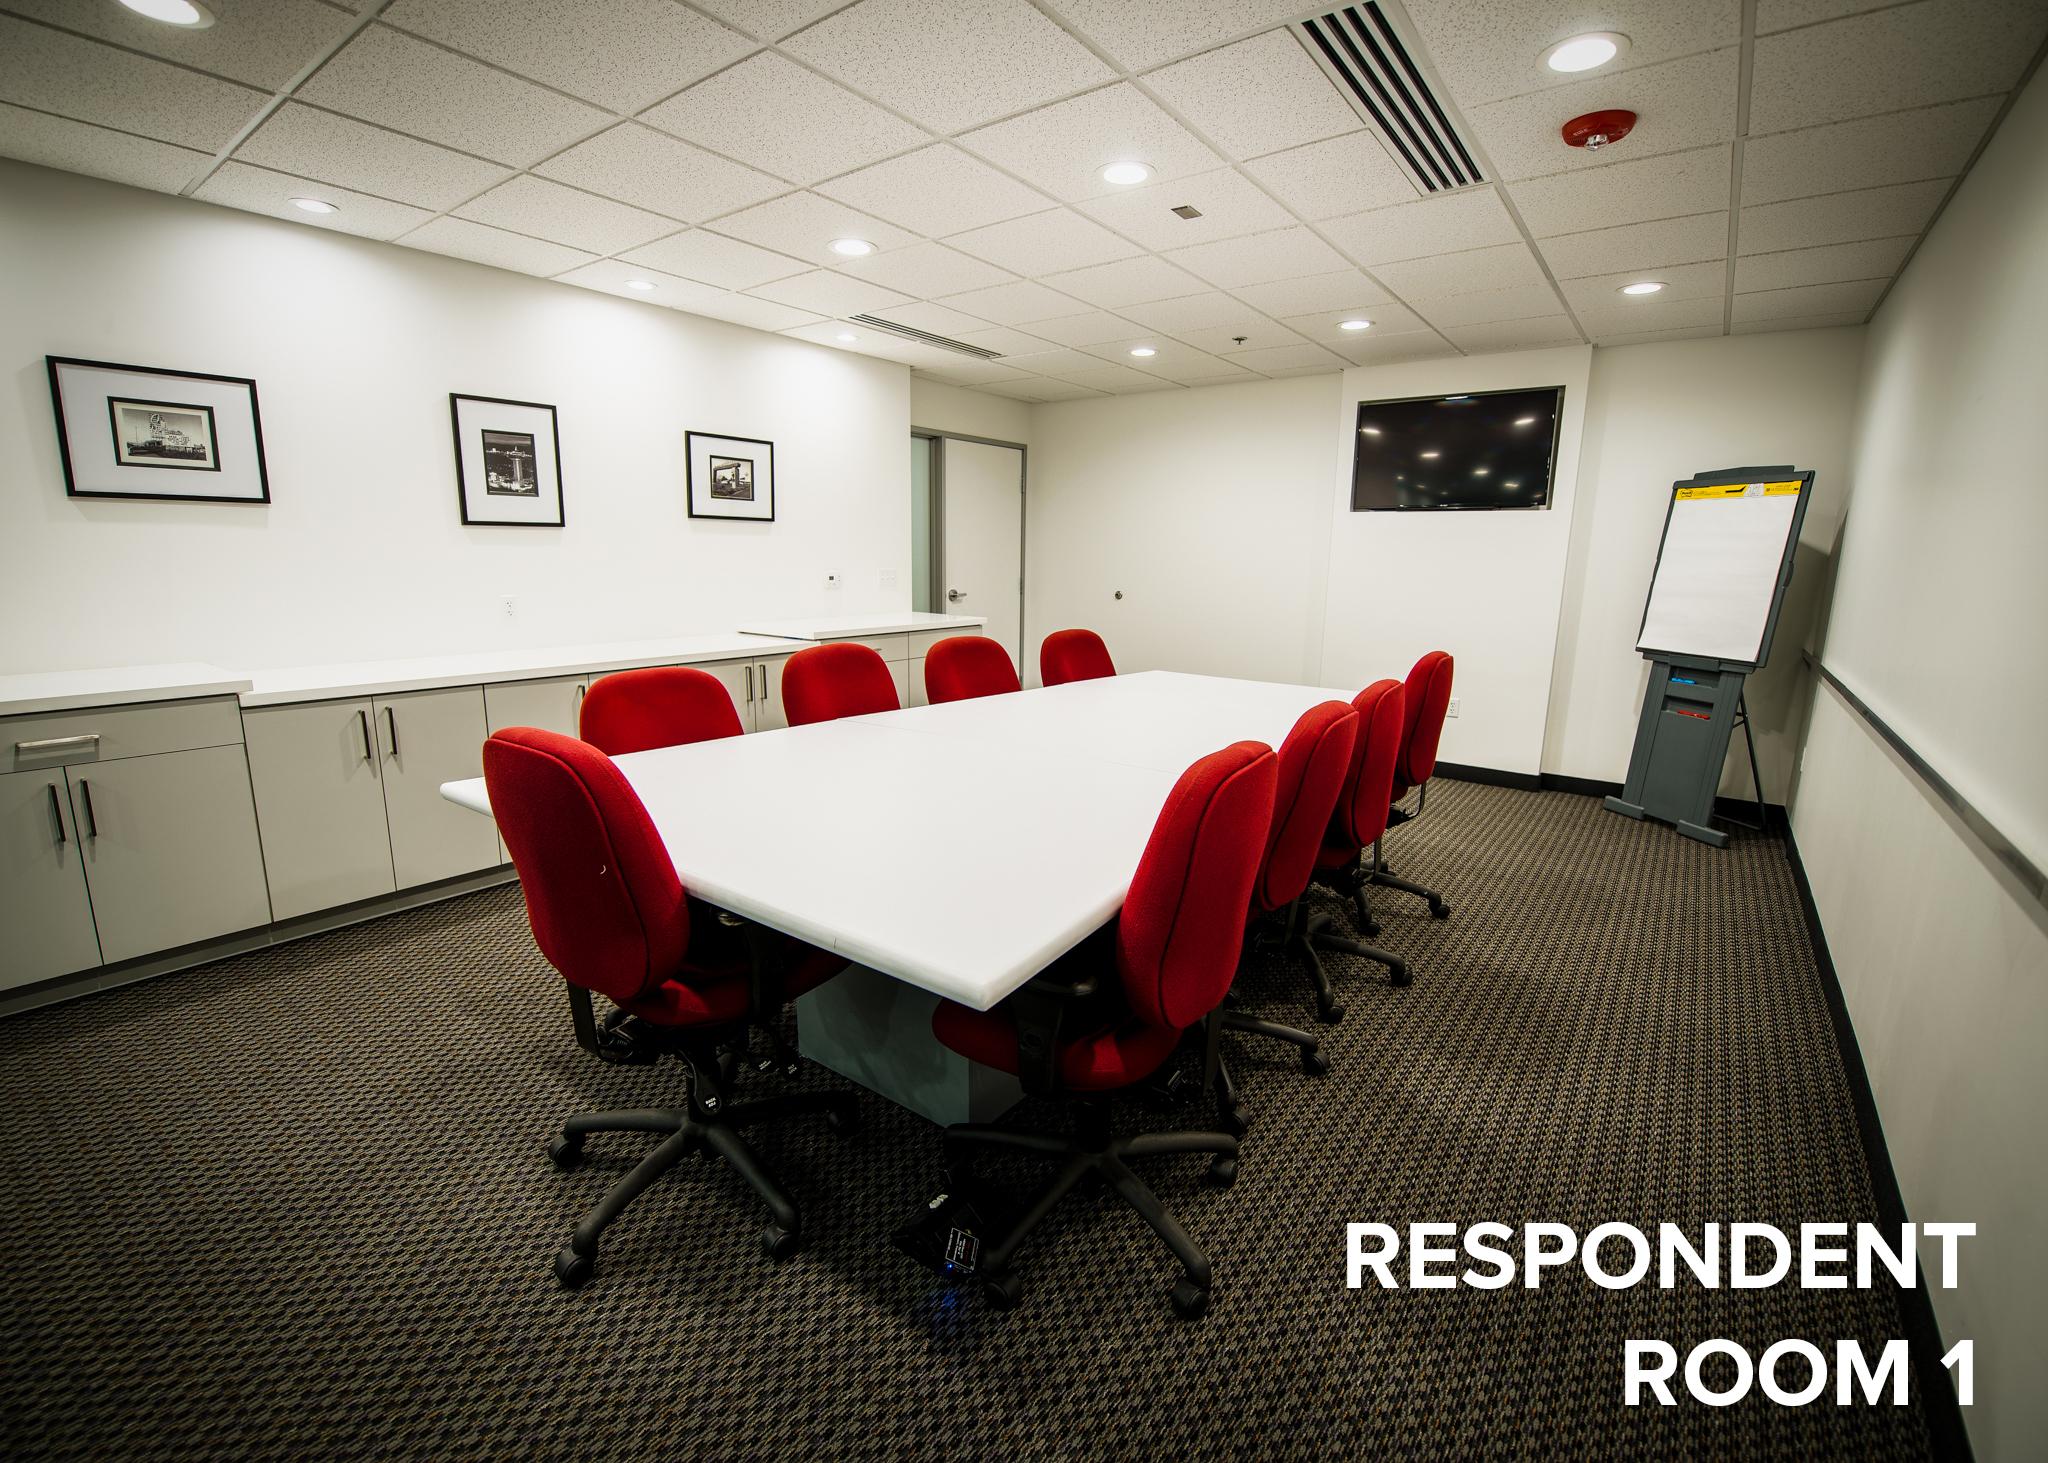 Respondent Room 1.jpg